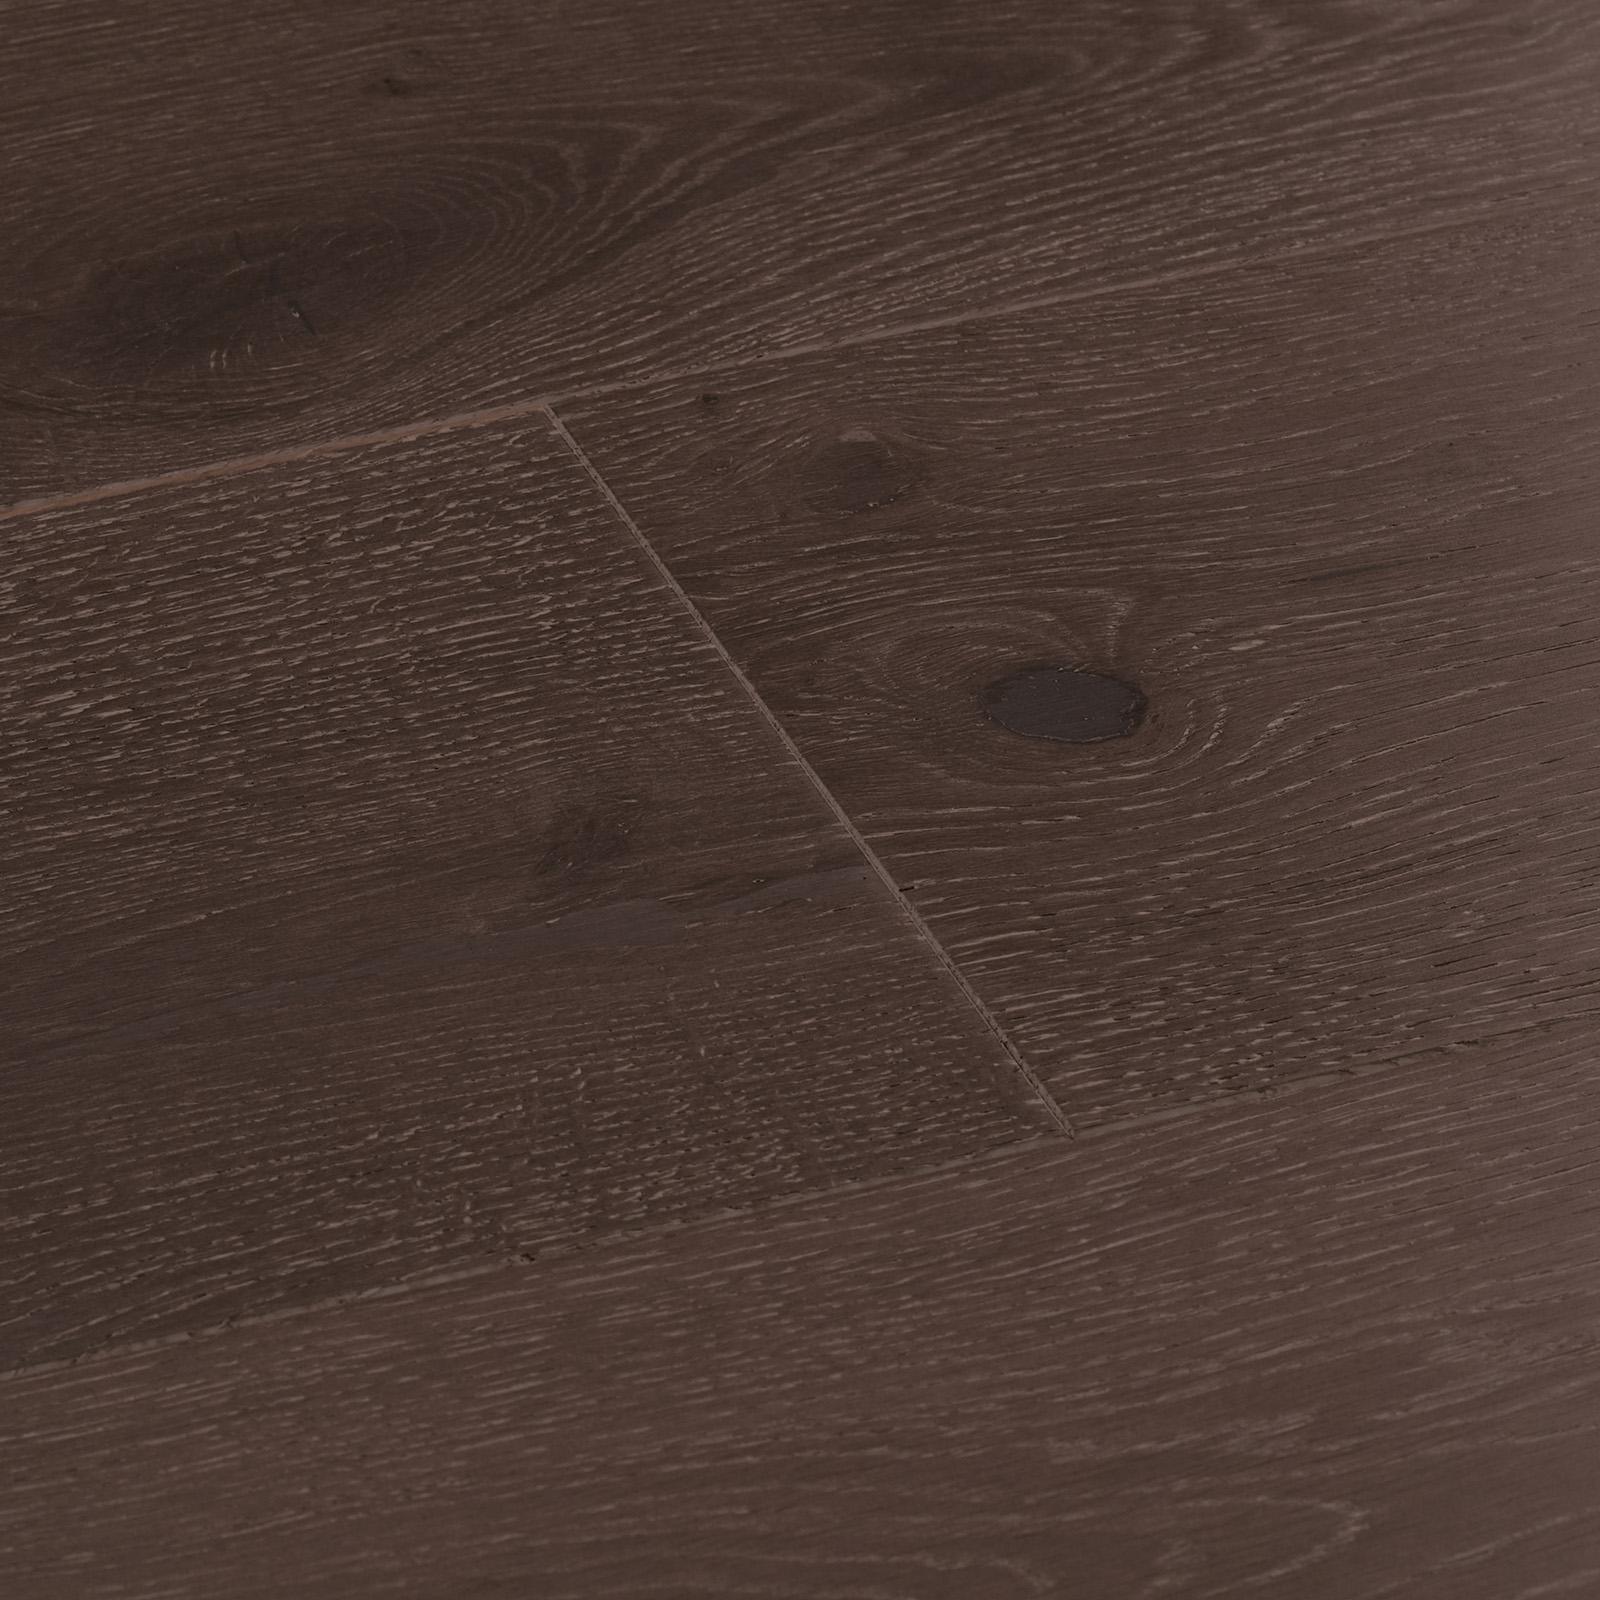 engineered wood flooring. Modern living room with Sacombe shadow oak flooring